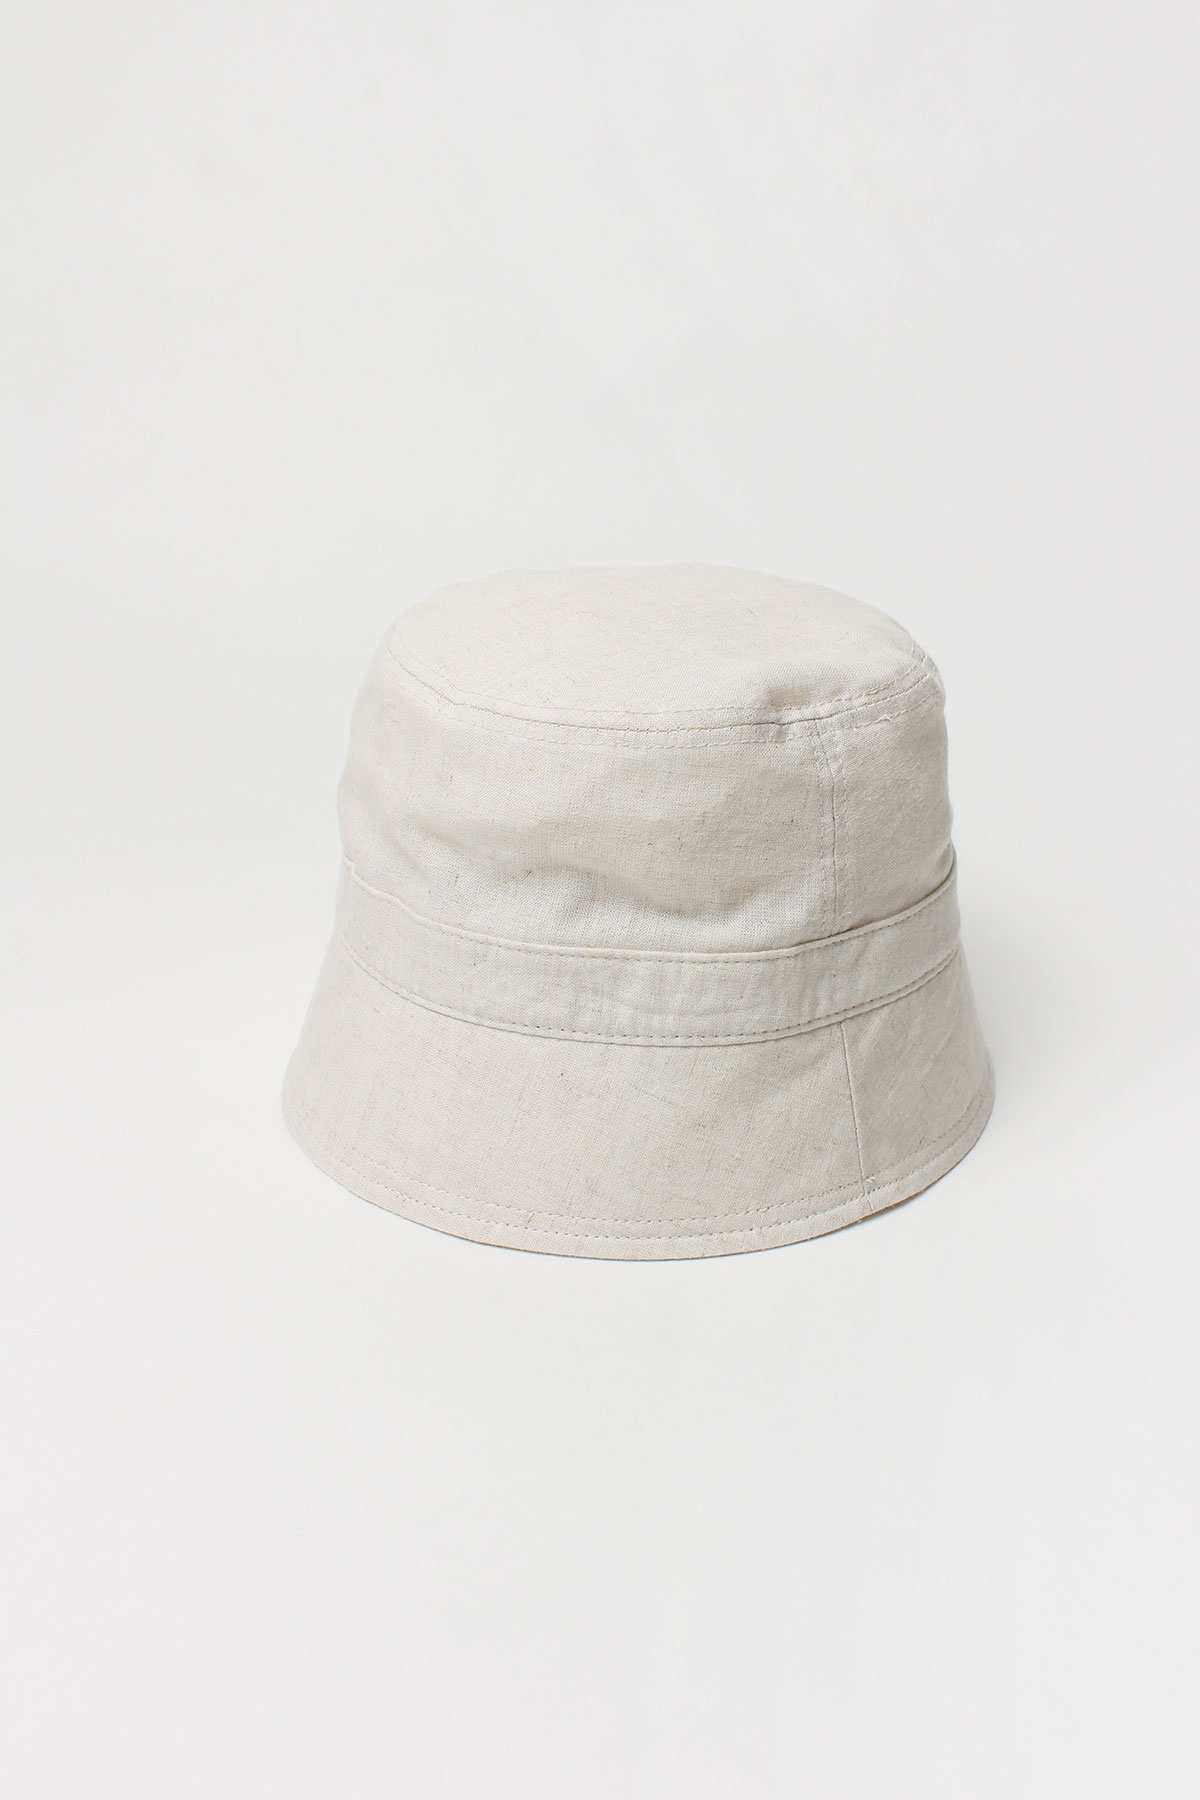 LINEN BUCKET HAT (CREAM,BEIGE,BLUE,BLACK)